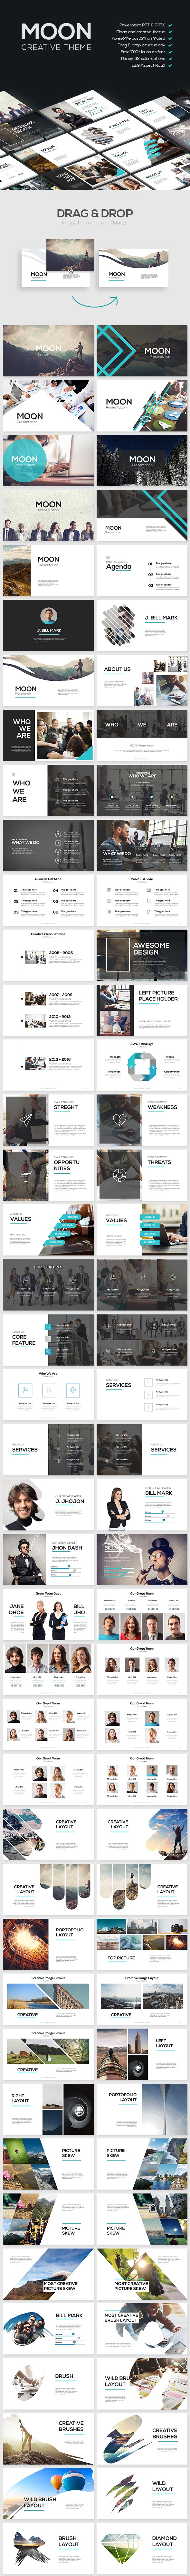 MOON - Creative Theme - PowerPoint Templates Presentation Templates